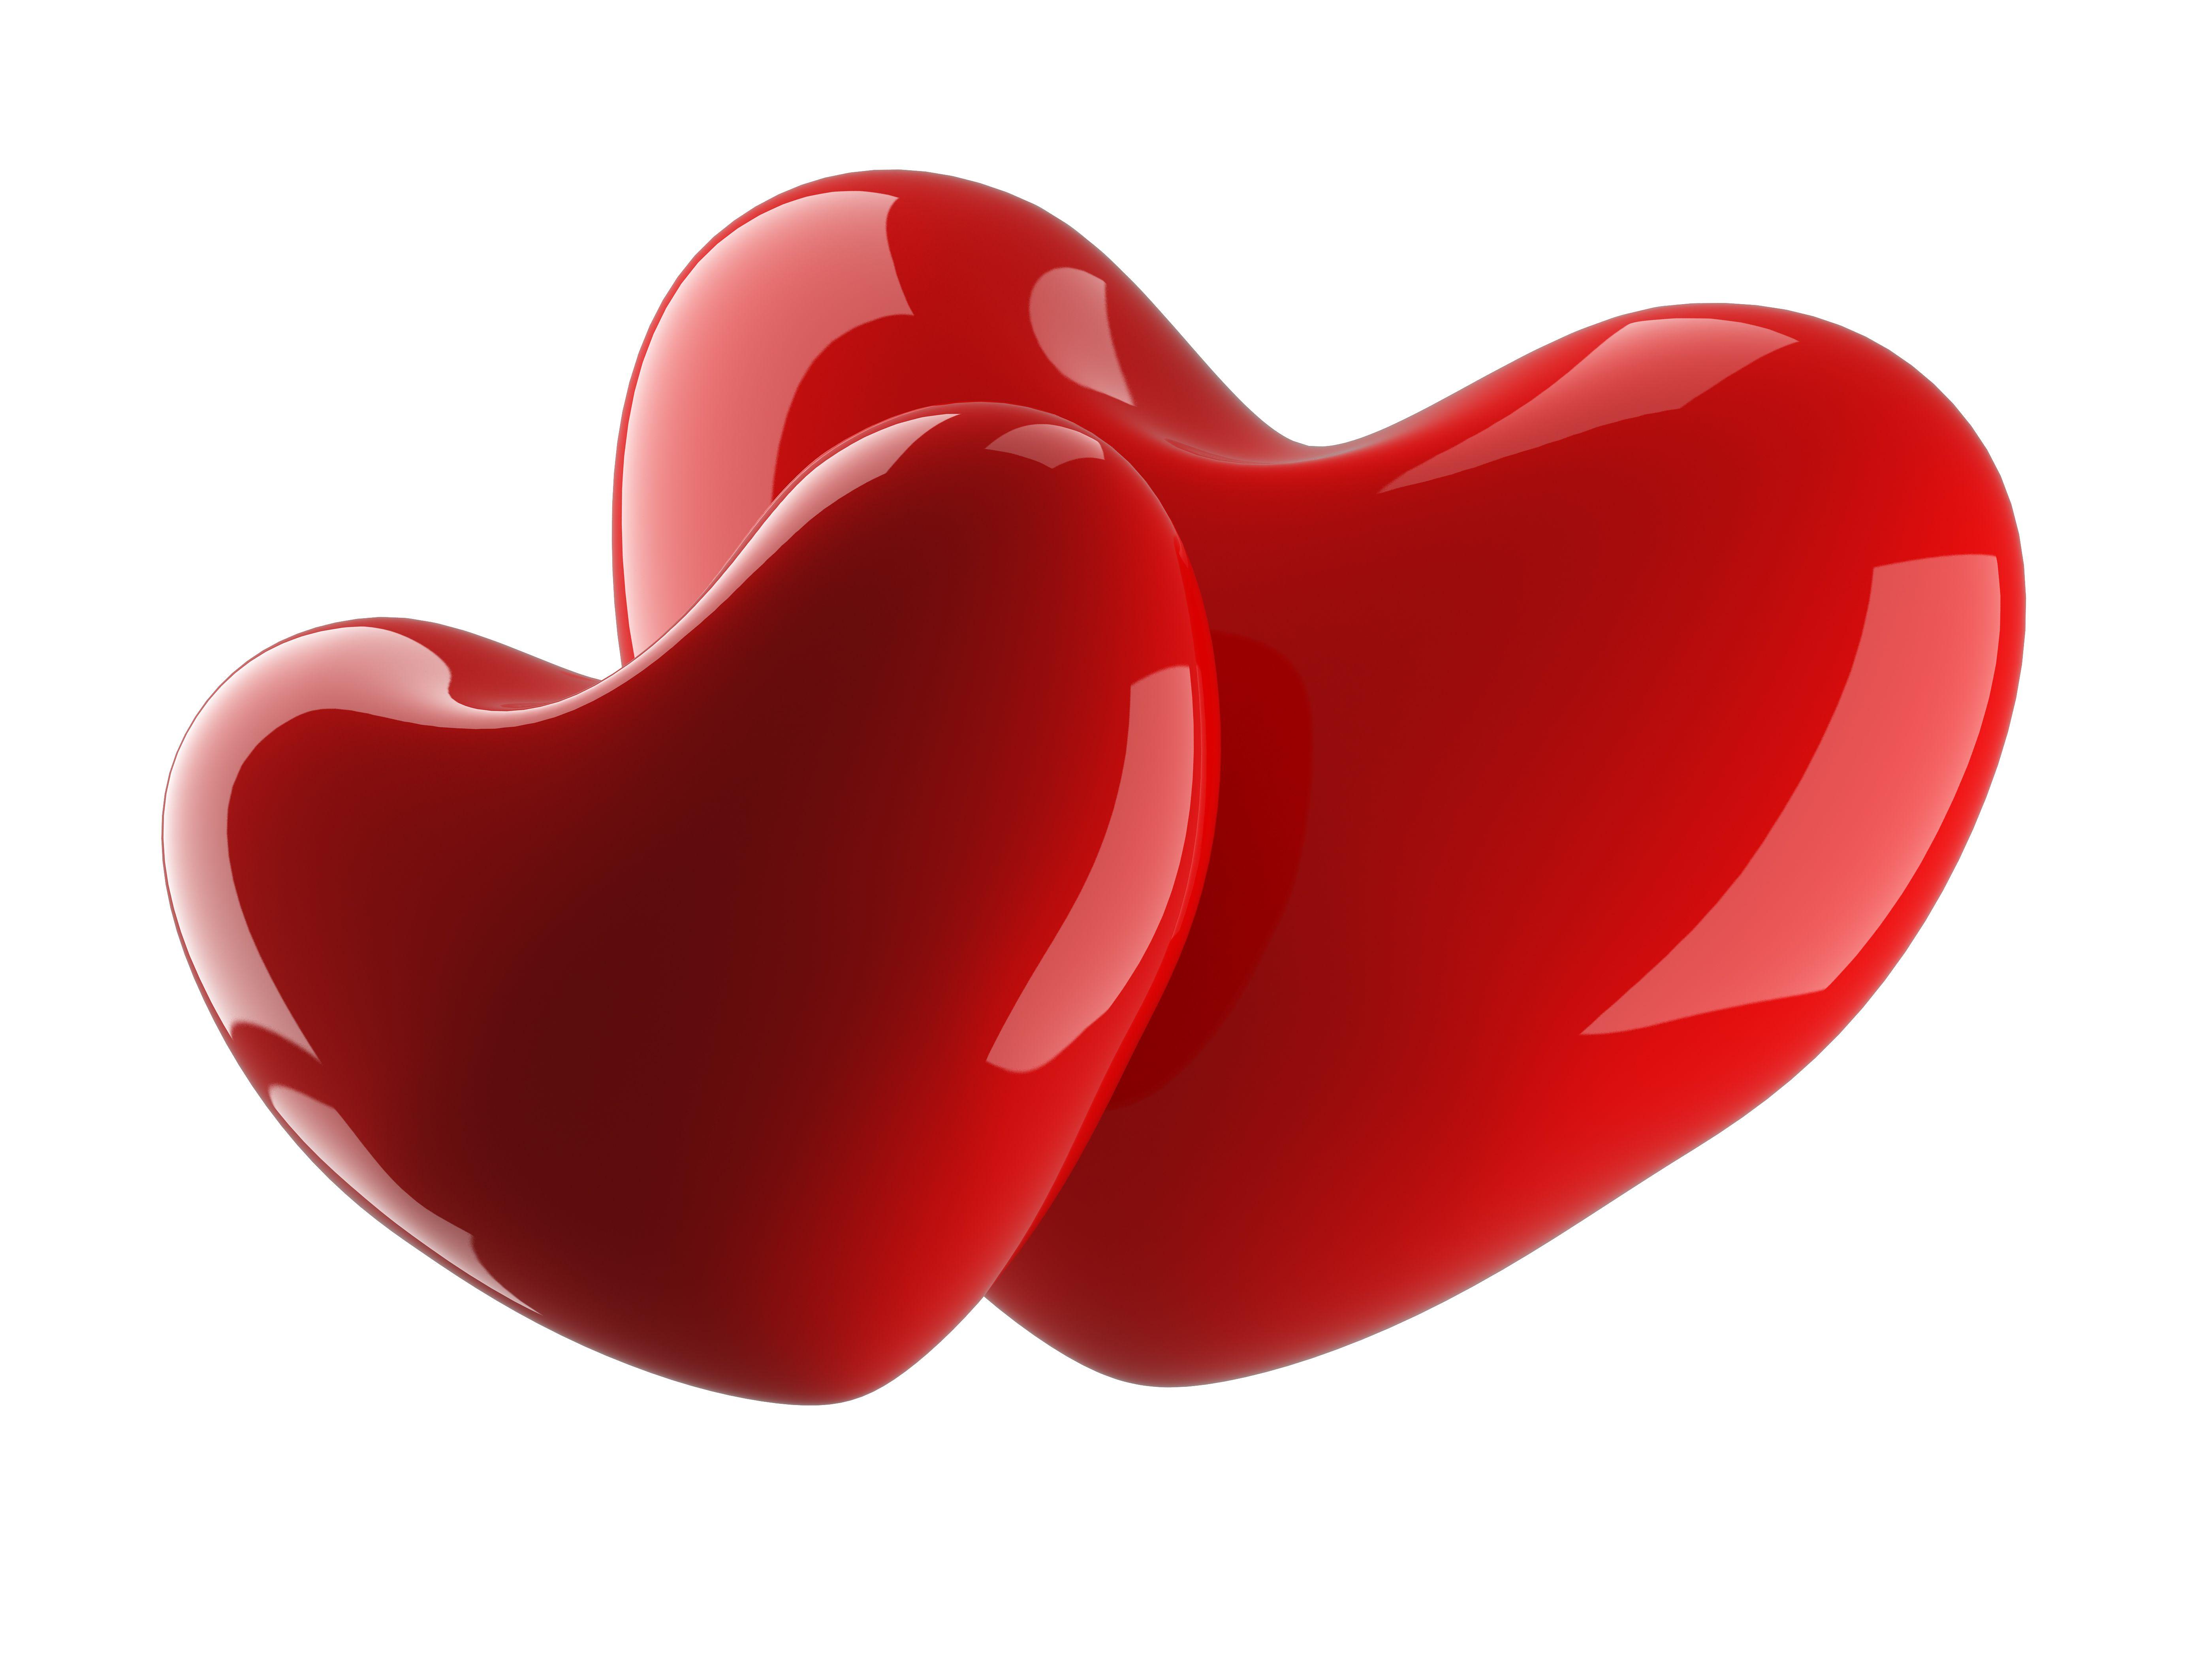 3д картинки сердечки